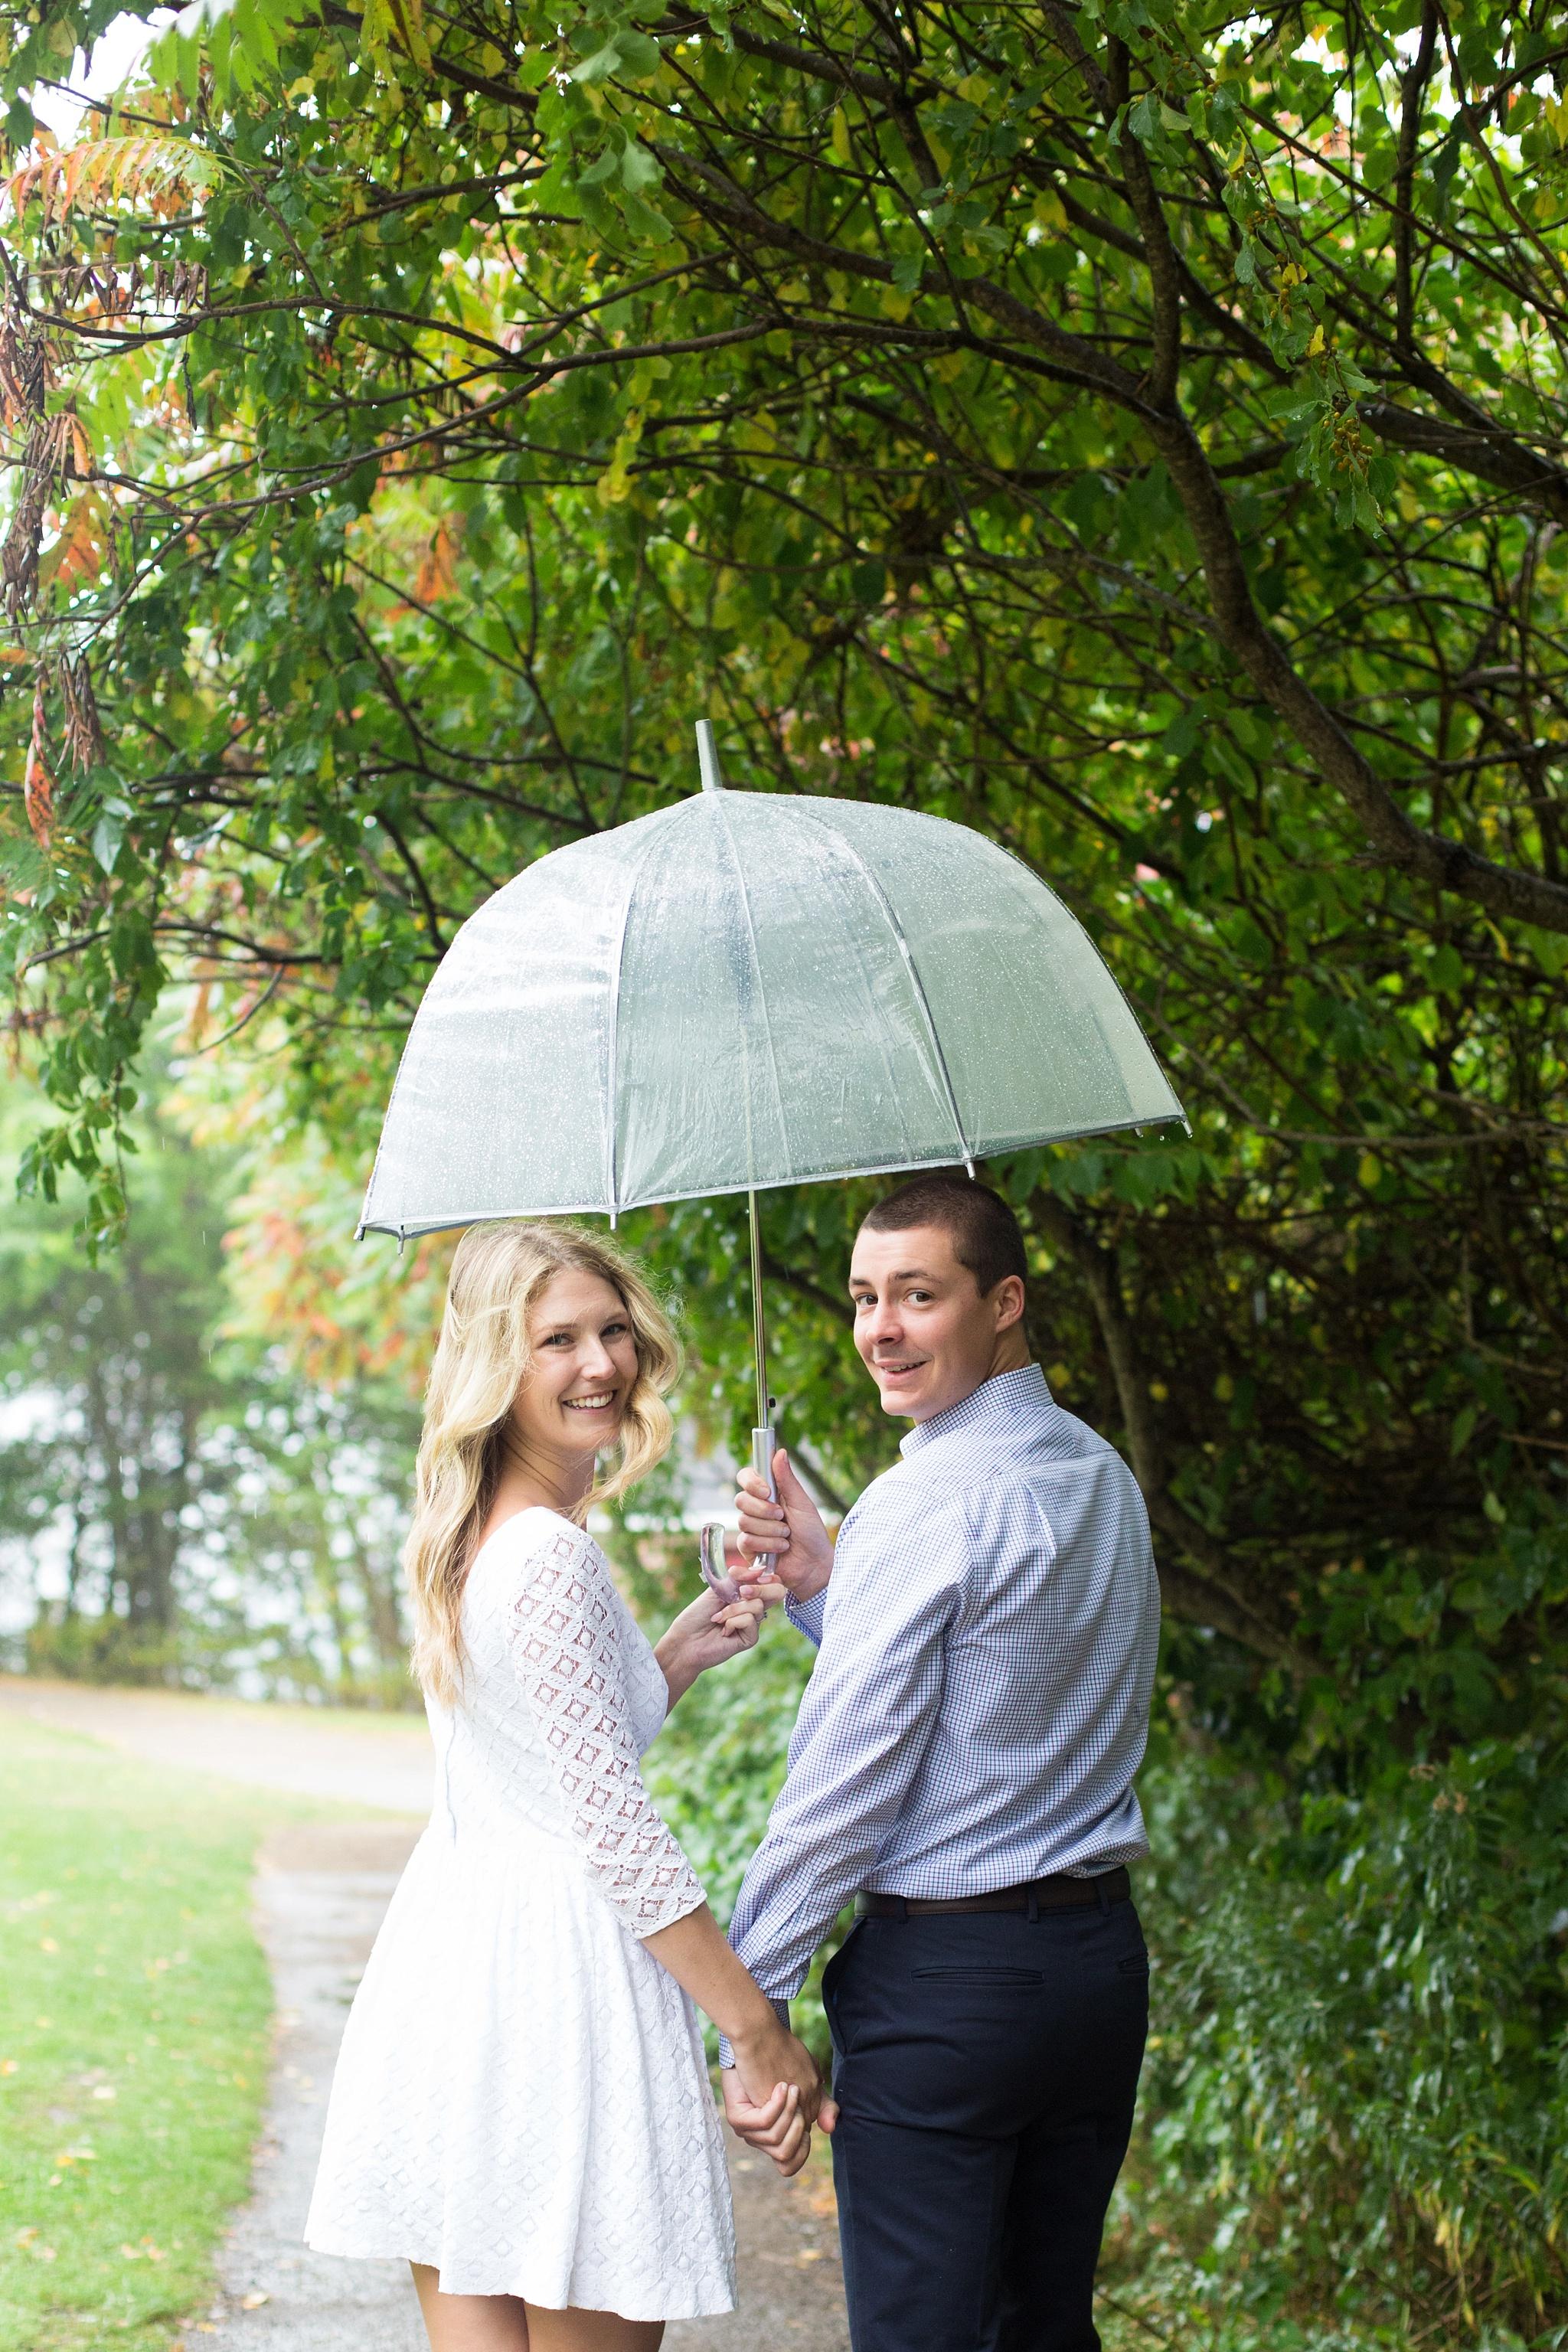 engagement pics in rain